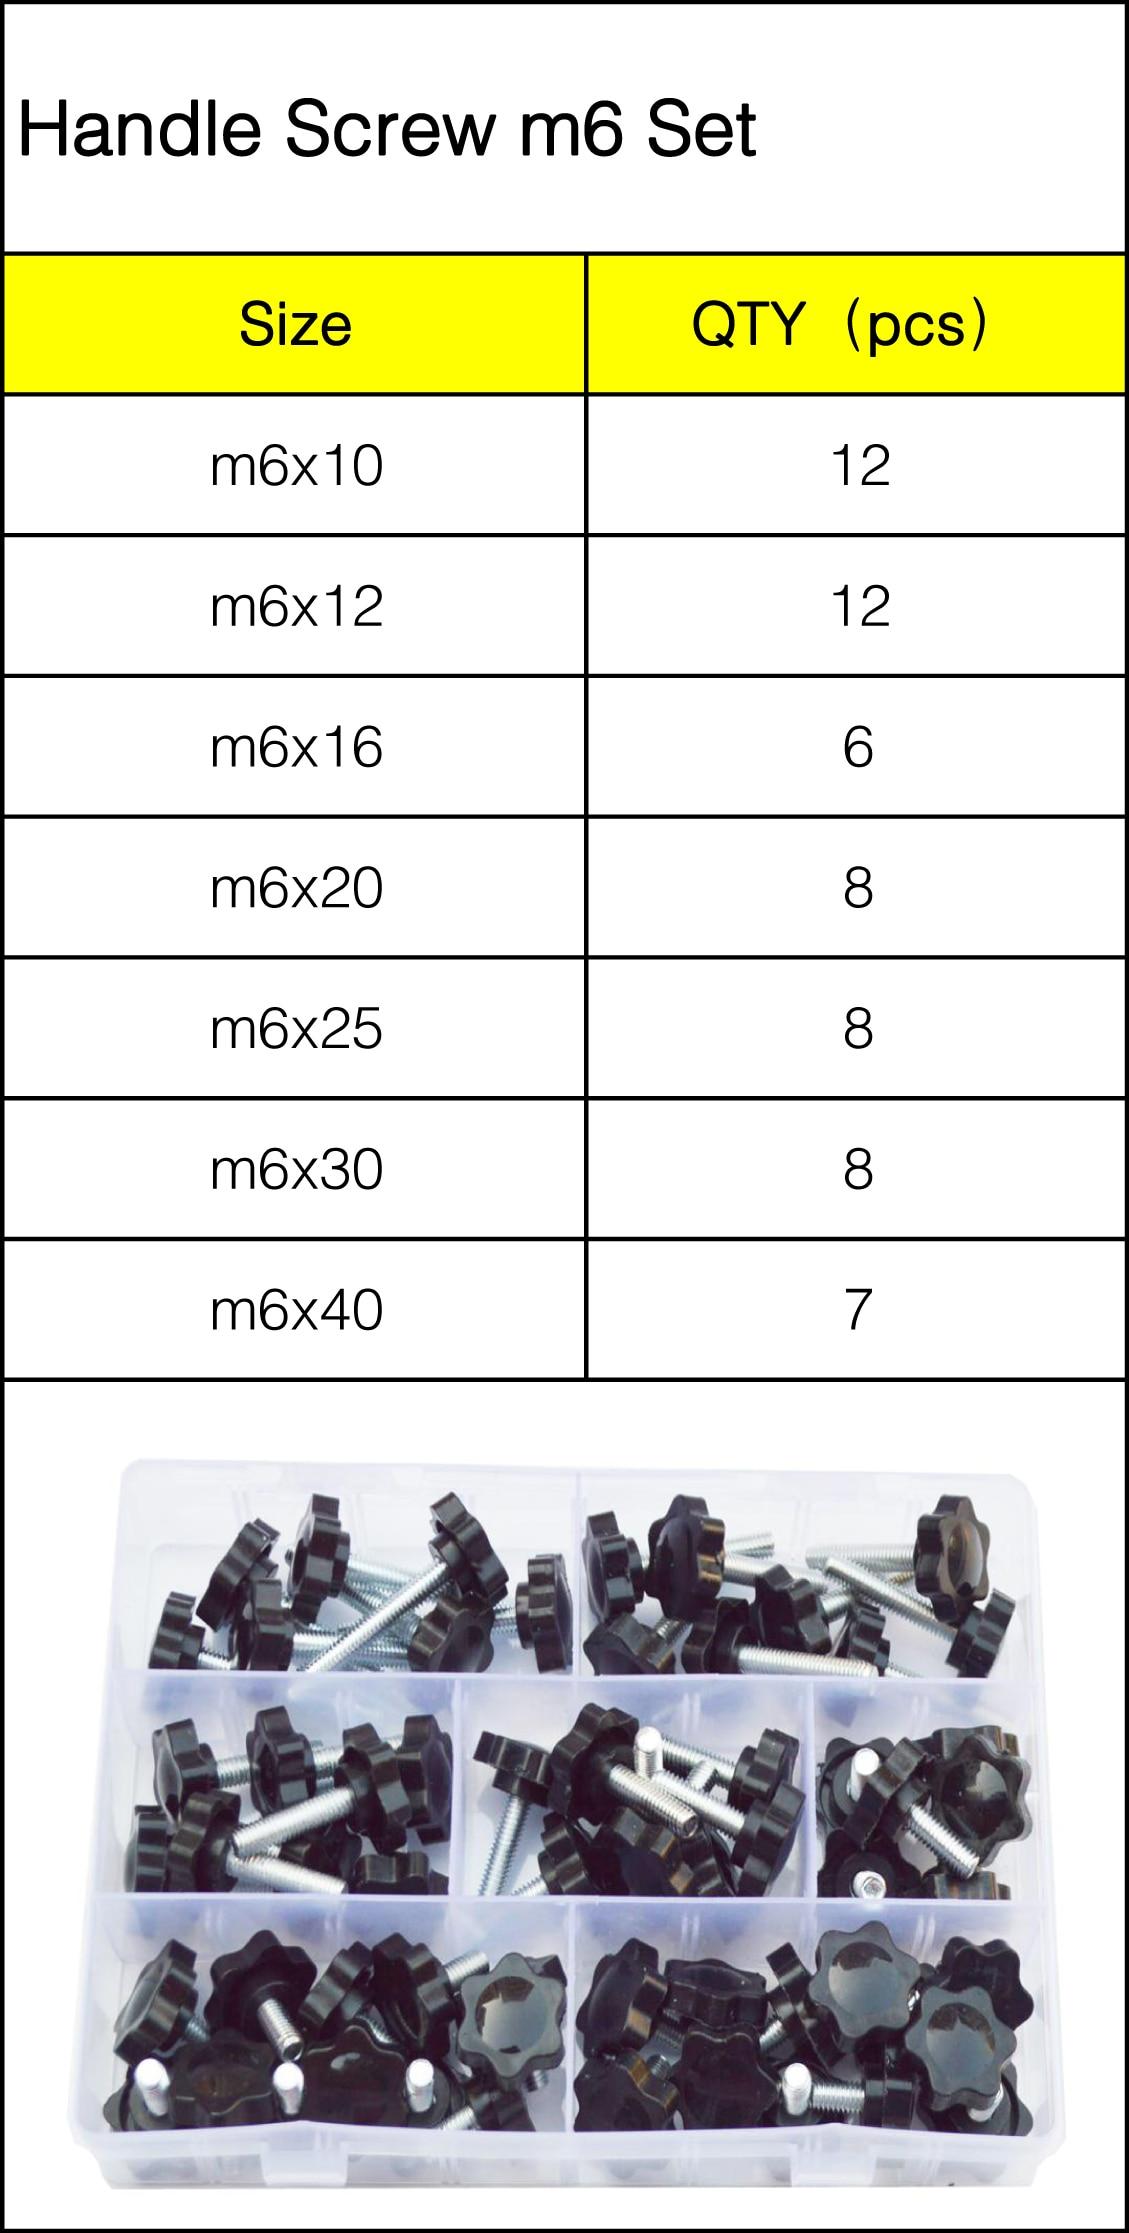 M4 Bakelite Star Stainless Screw Handle Plastic Adjustable Knob Plum Bolts Red